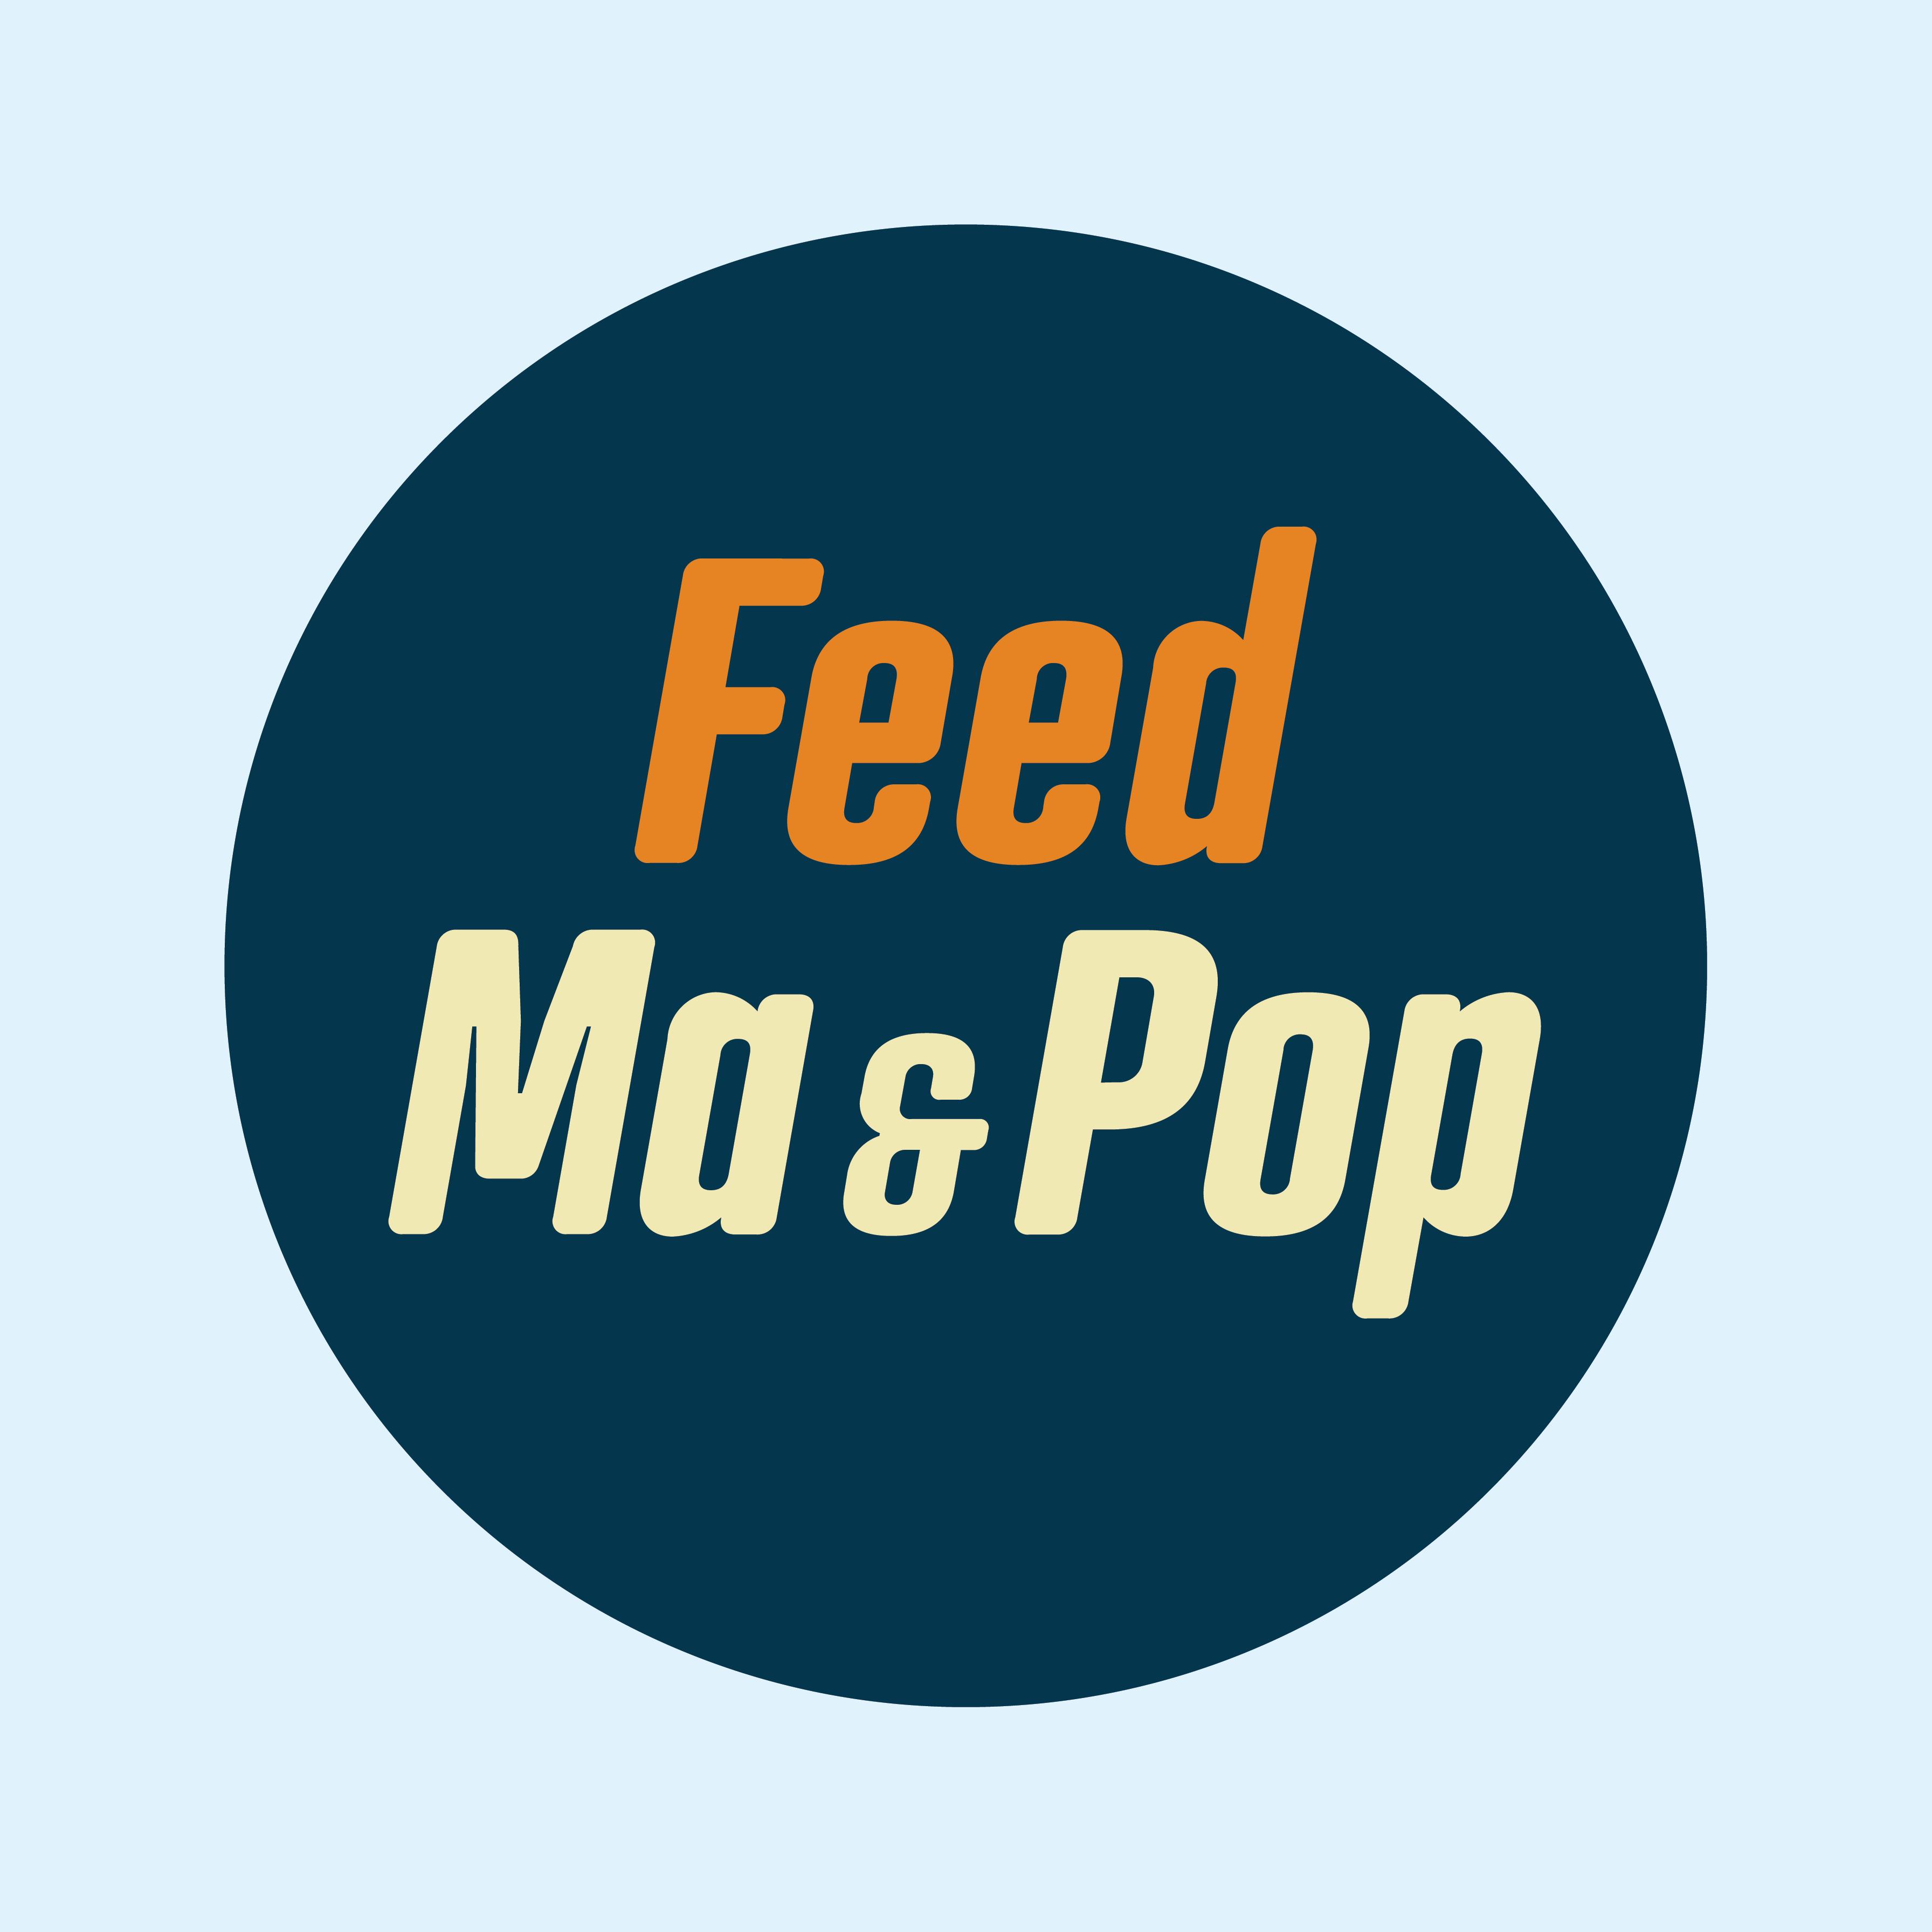 Feed Ma & Pop logo and a few screen designs